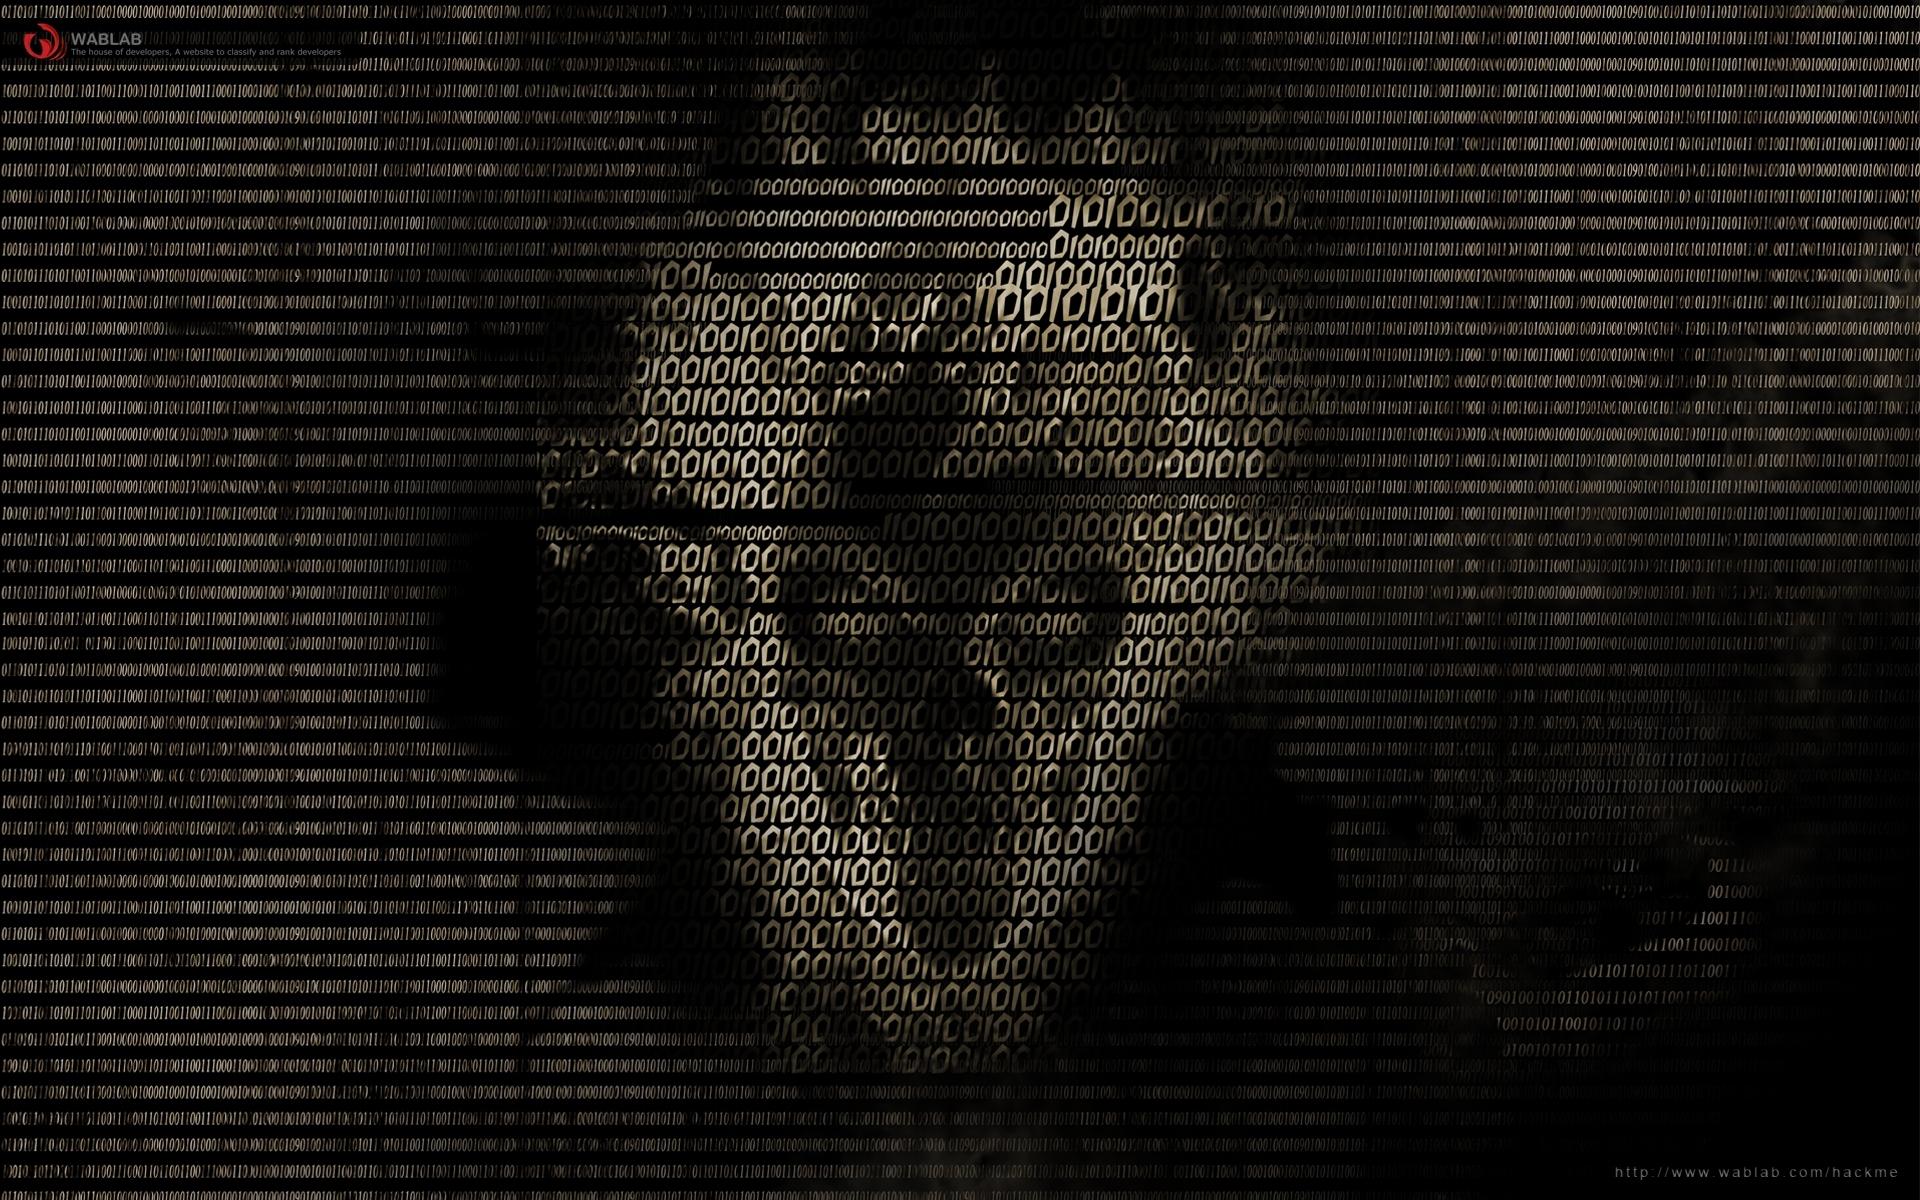 hacker full hd fond d'écran and arrière-plan | 1920x1200 | id:693176